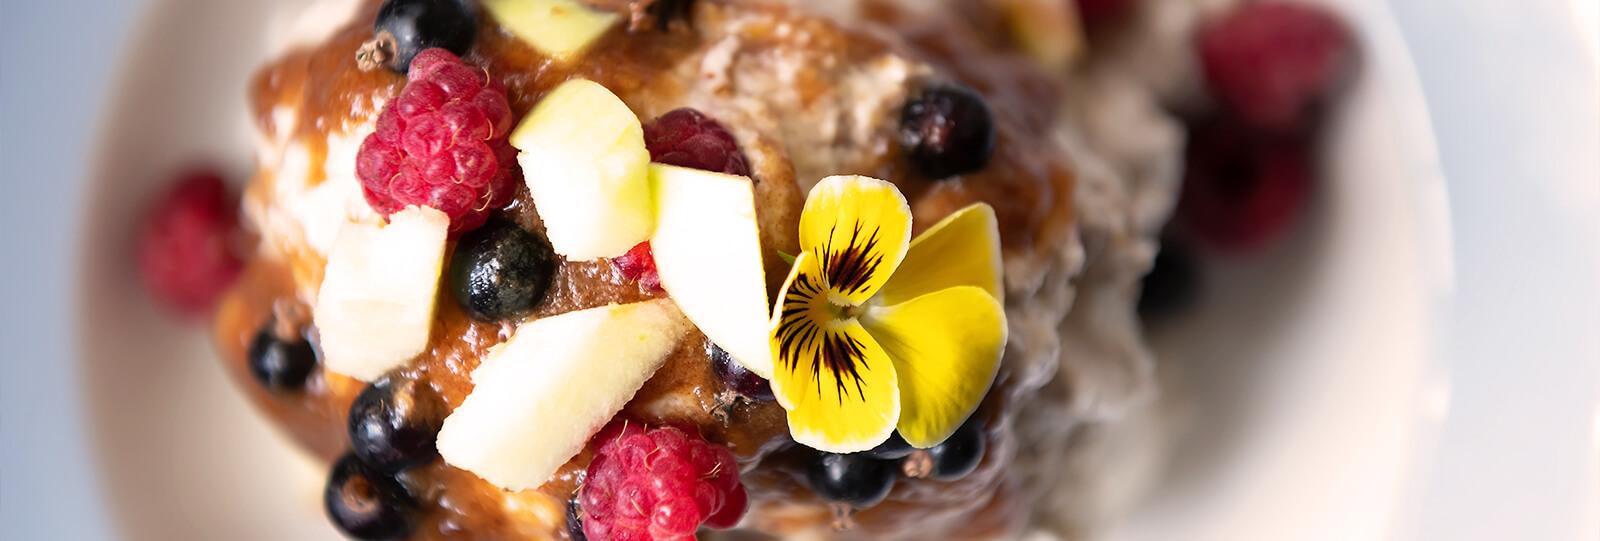 PFAS-holiday-garden-recipes-berry-dessert-pansy-flower-garnish